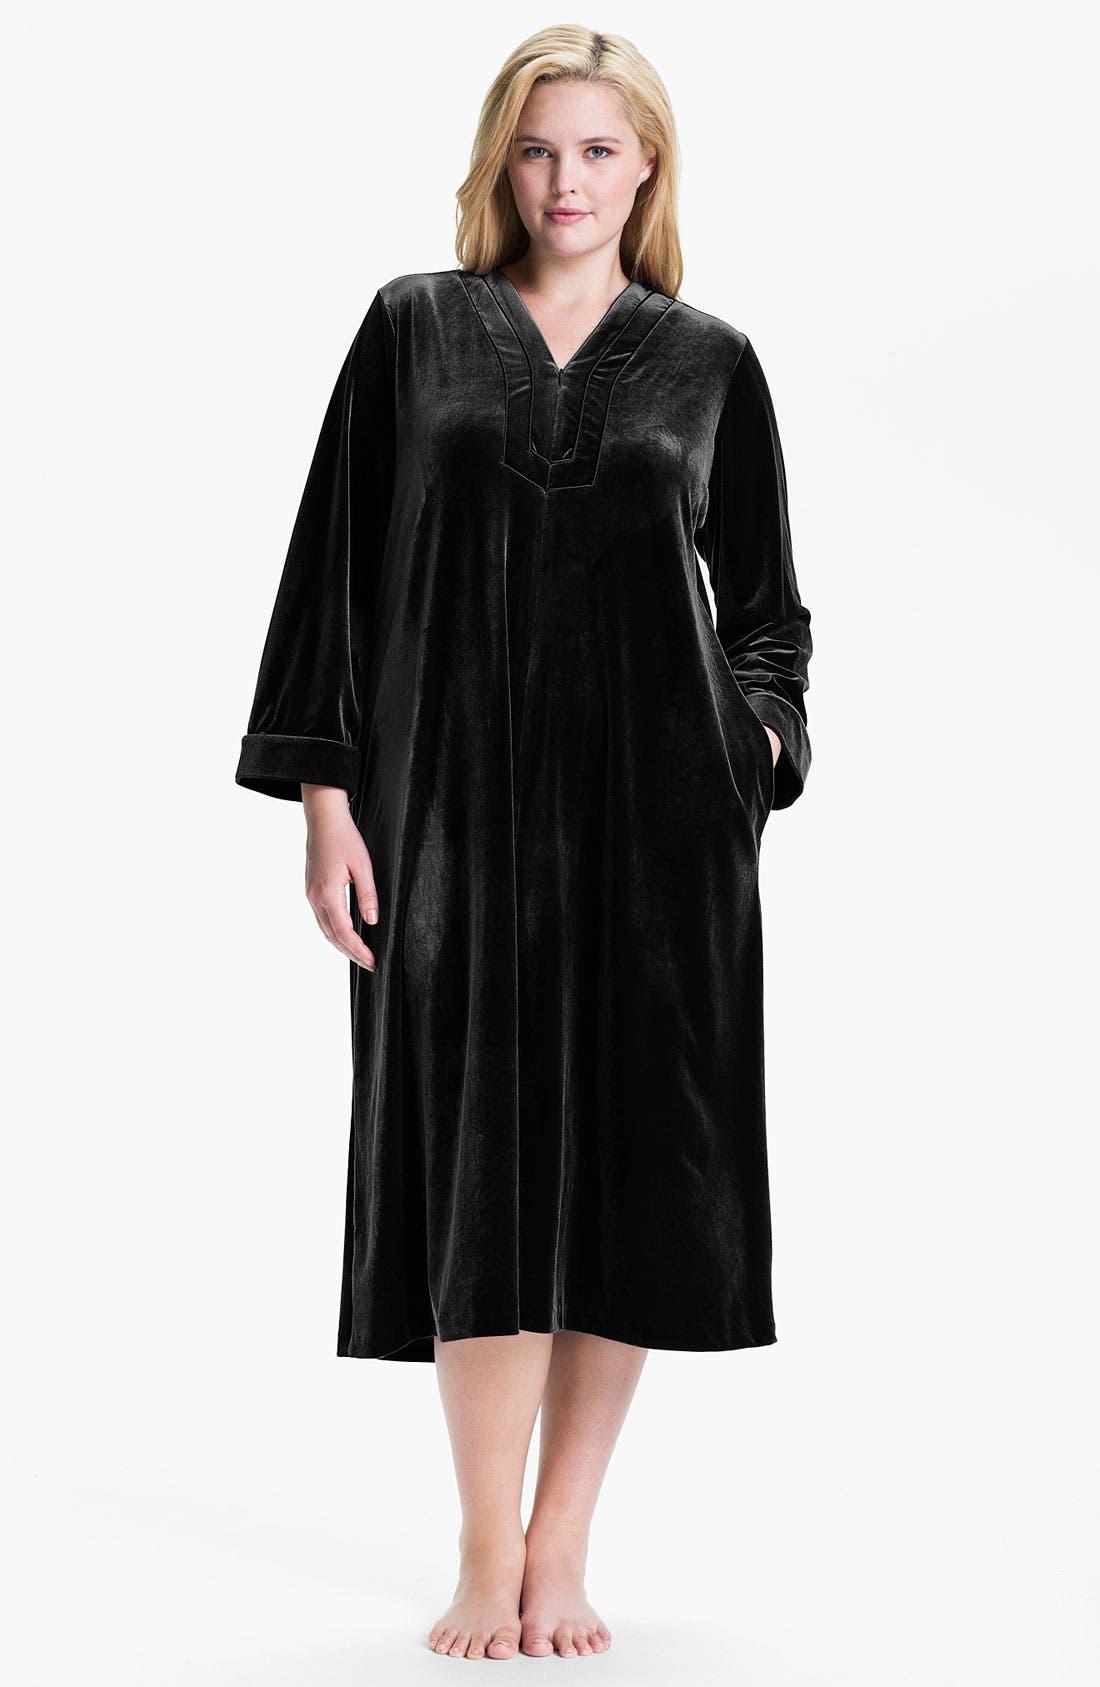 Alternate Image 1 Selected - Oscar de la Renta Sleepwear 'Zahara Nights' Robe (Plus)